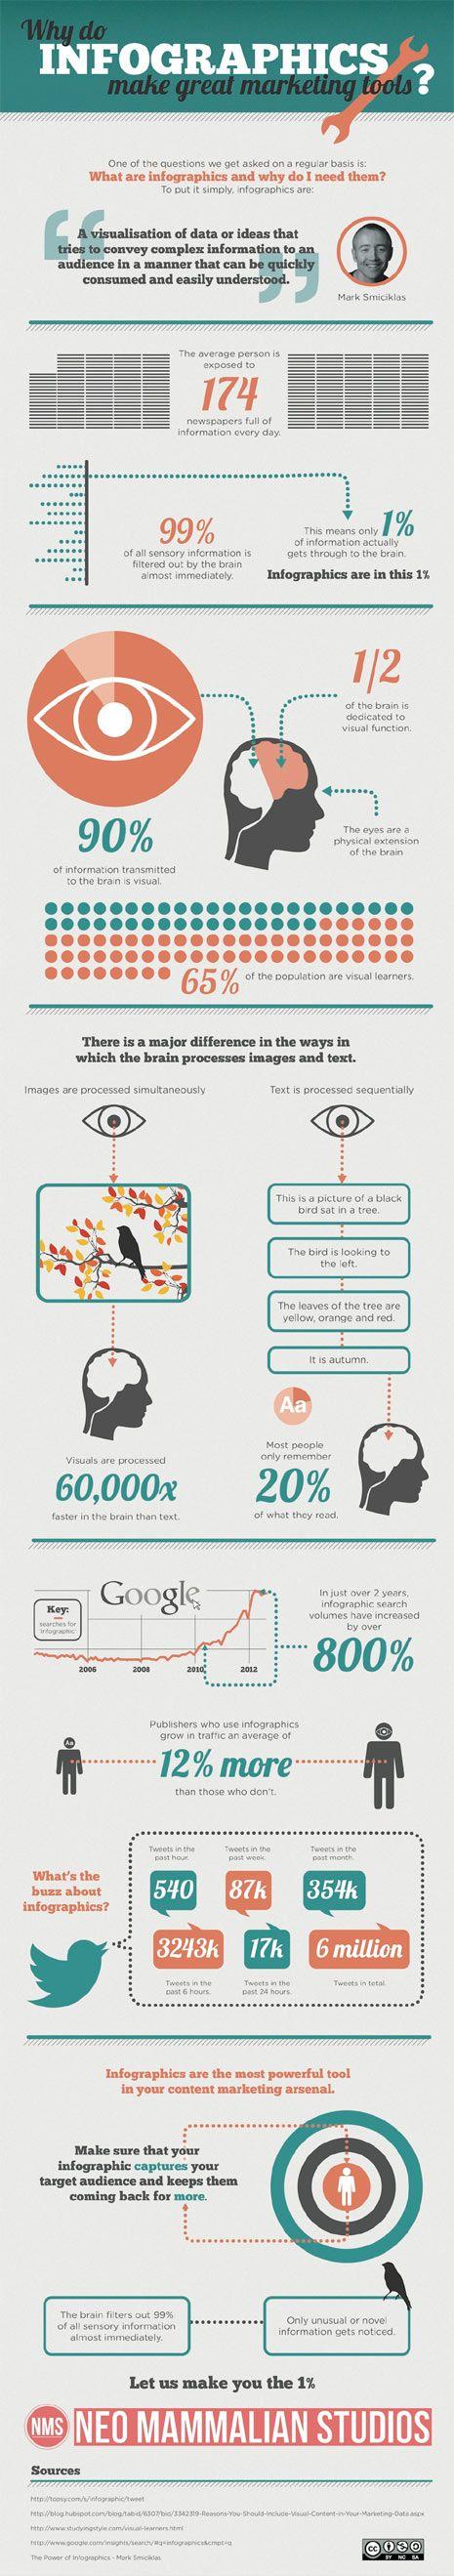 Why do infographics make great marketing tools? #SocialMedia